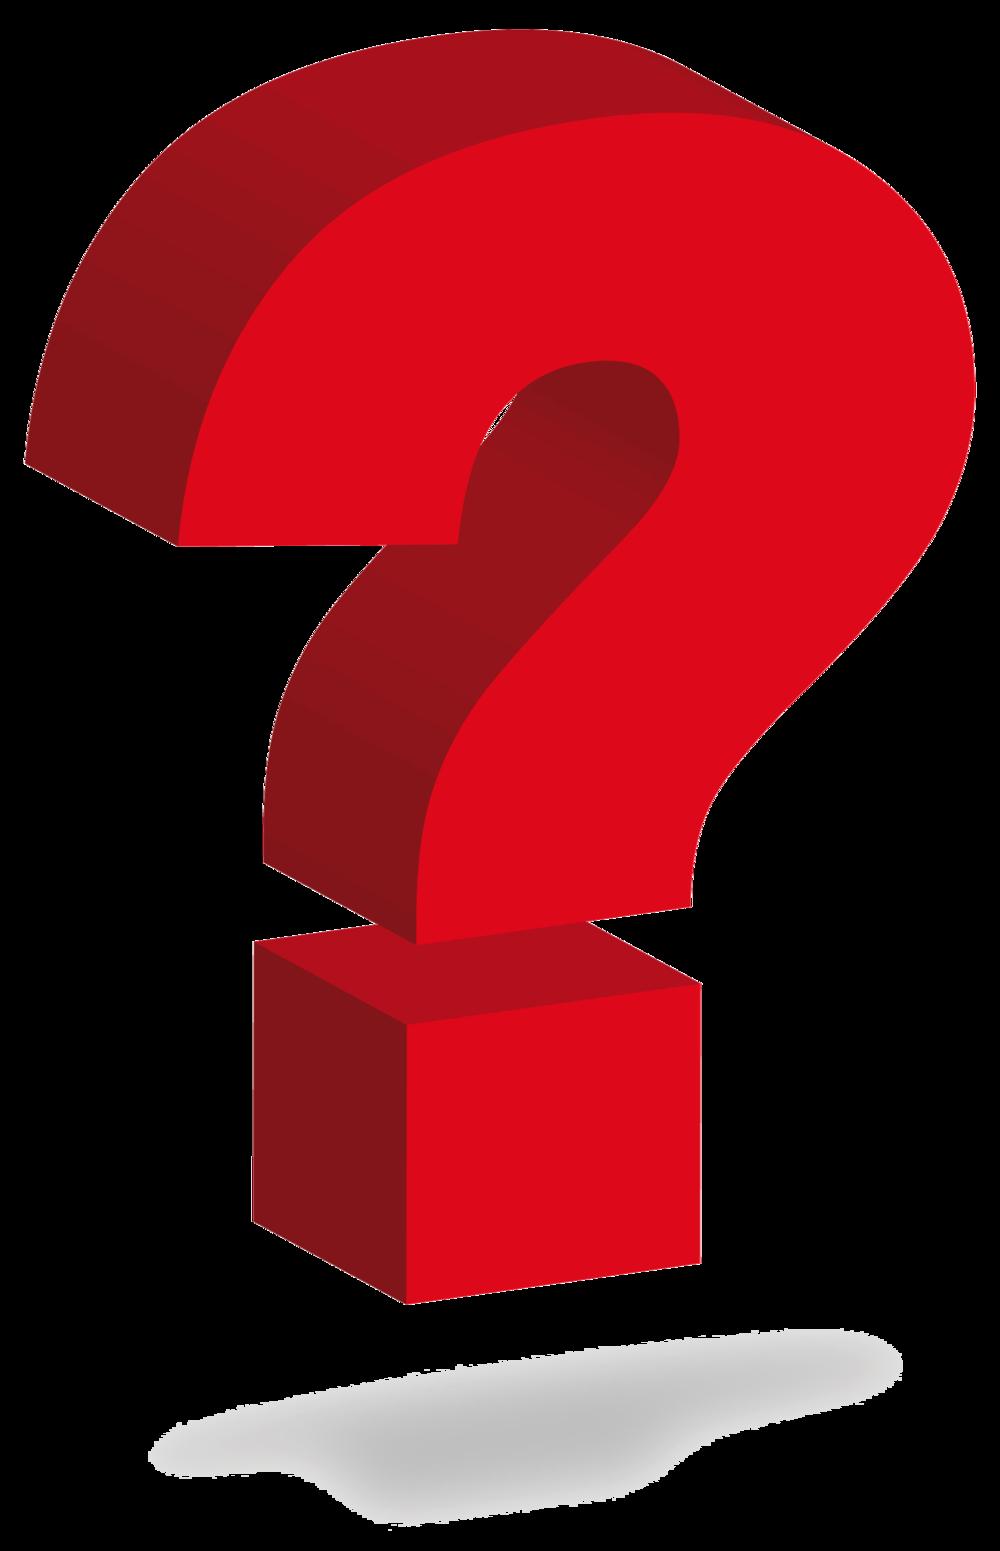 Question Mark Clipart.